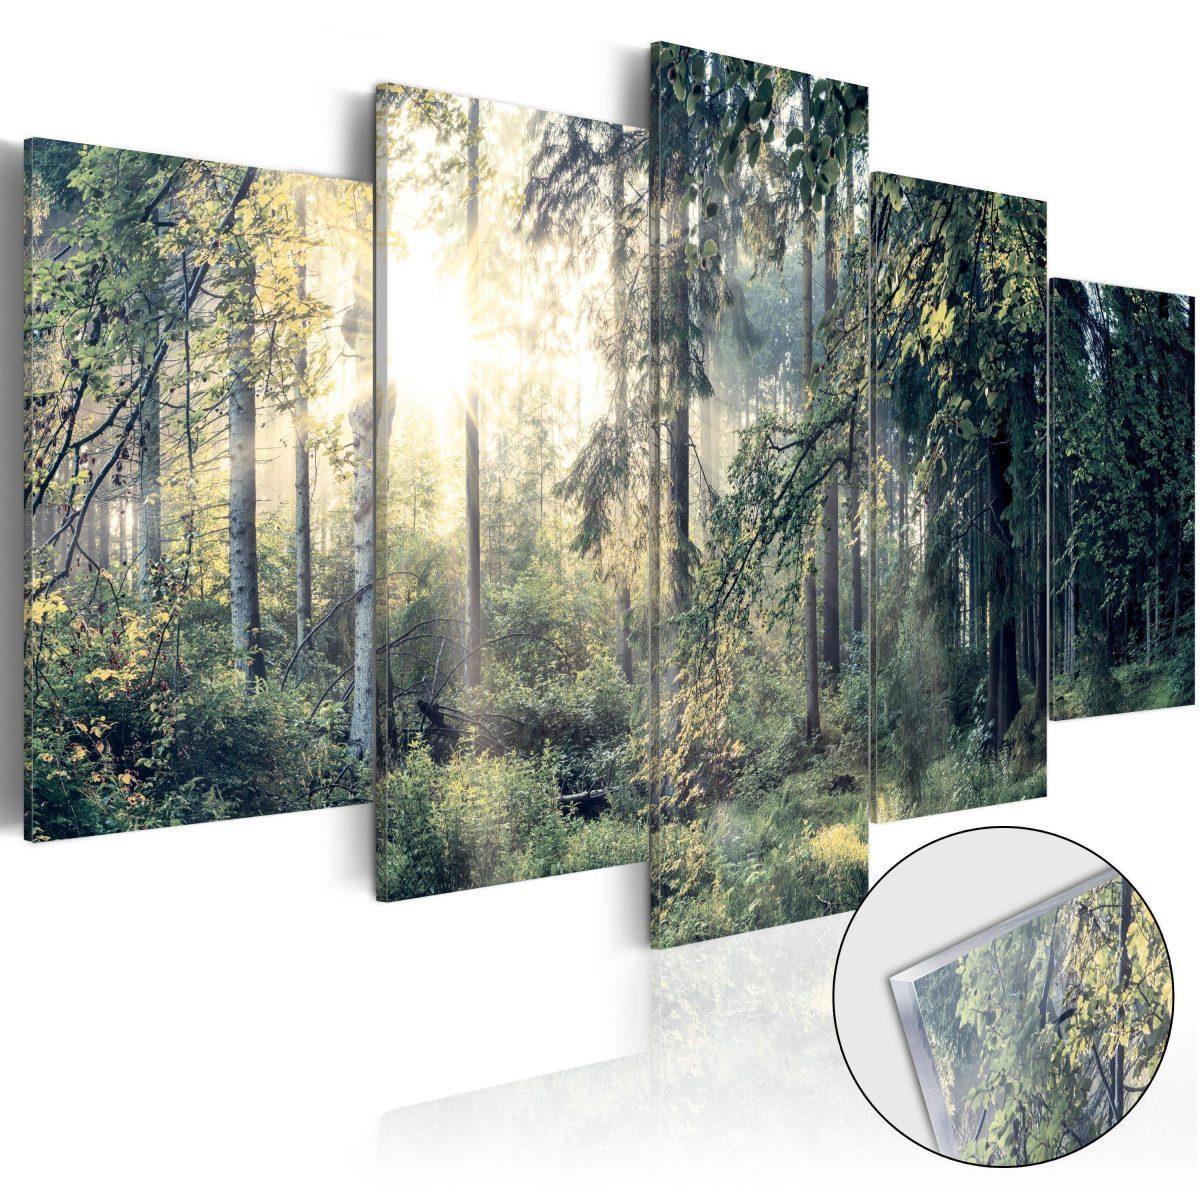 Tavla i akrylglas - Fairytale Landscape - 100x50